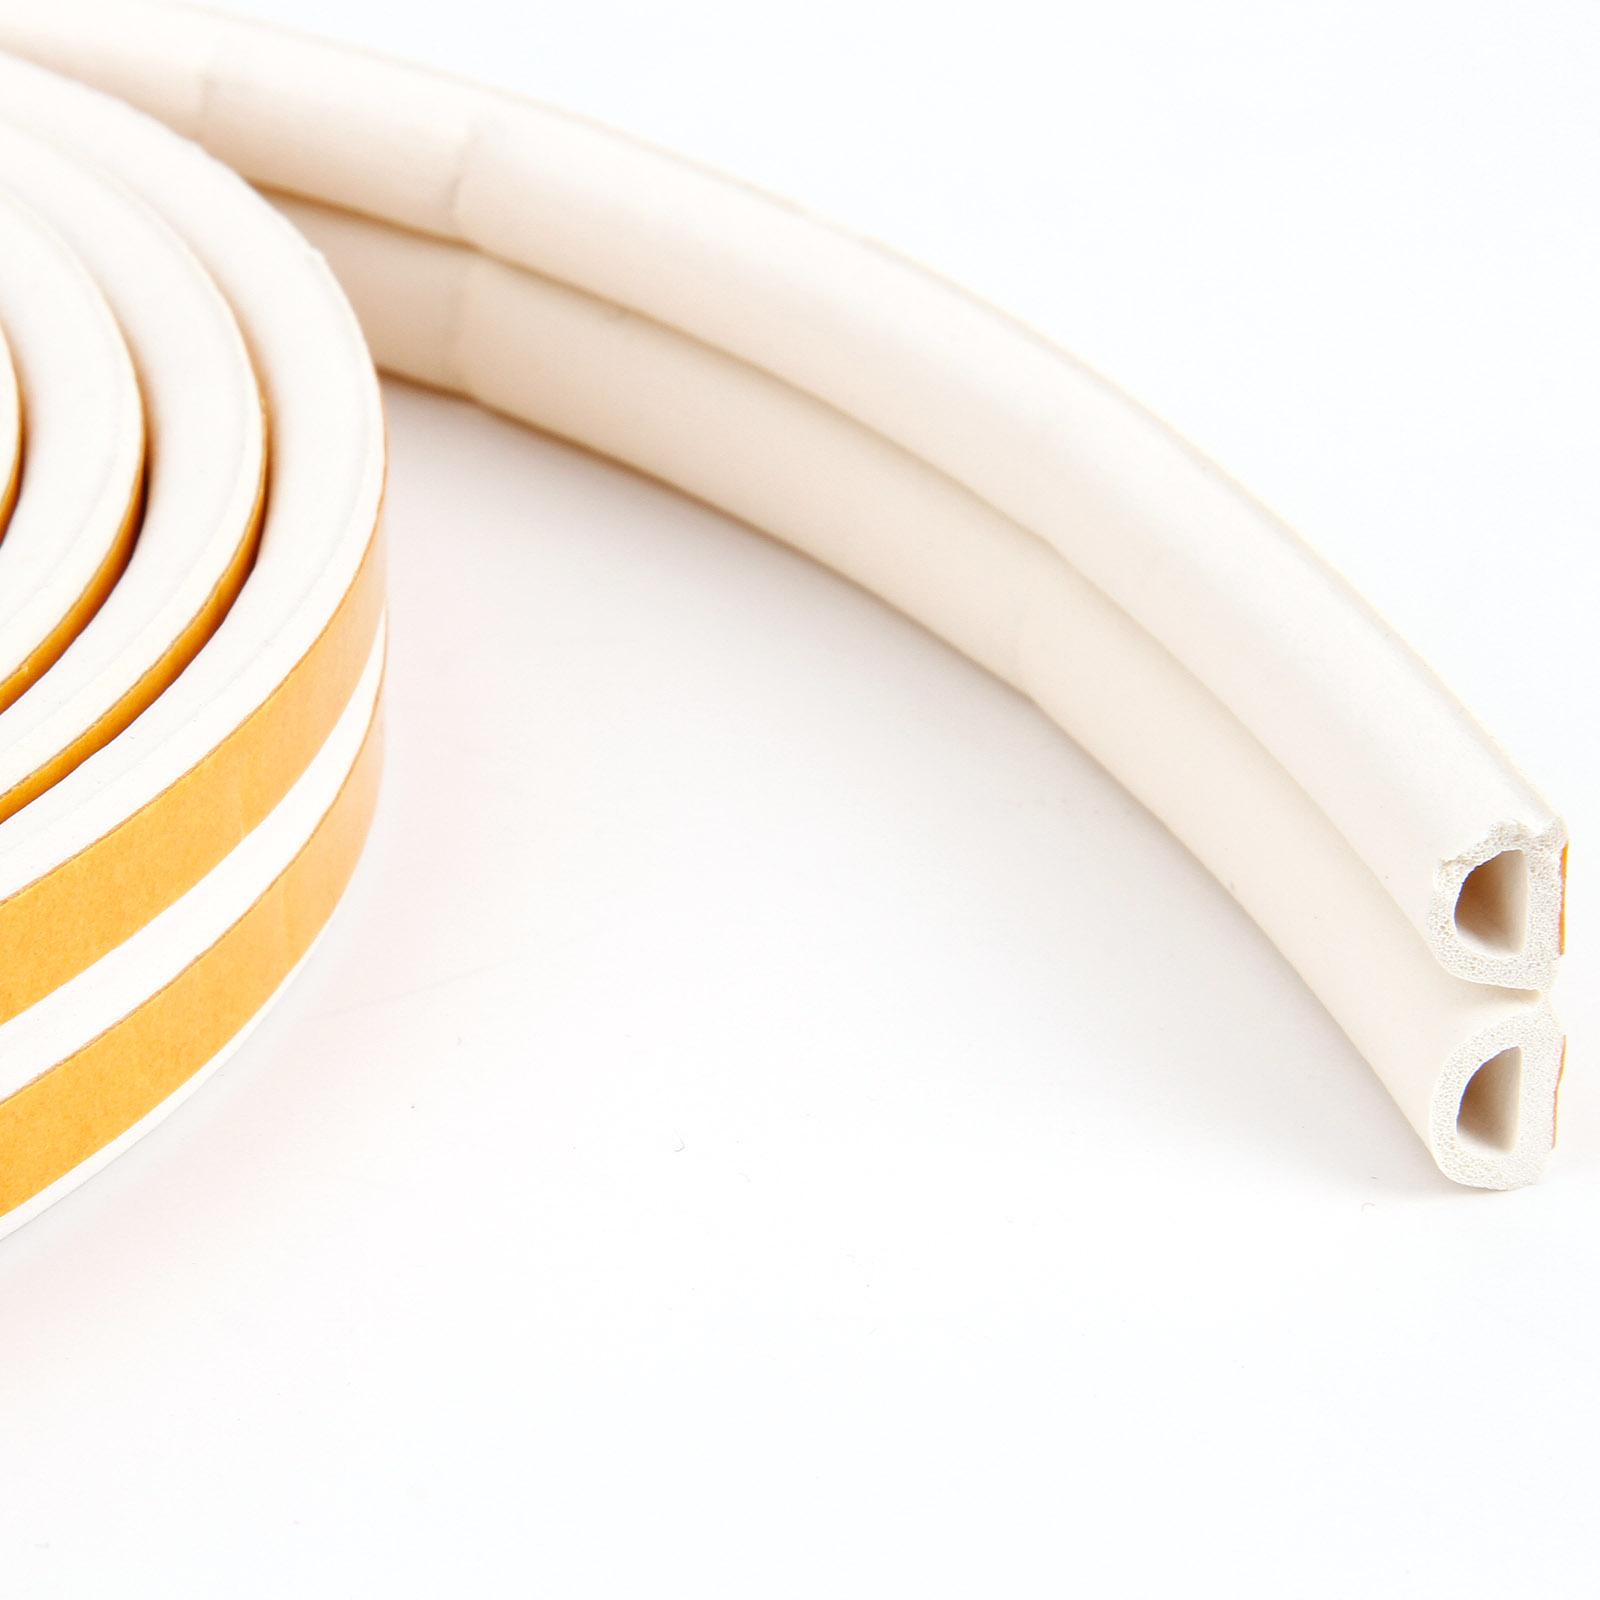 bande joint caoutchouc protection boudin fenetre porte 6m forme profile d blanc ebay. Black Bedroom Furniture Sets. Home Design Ideas